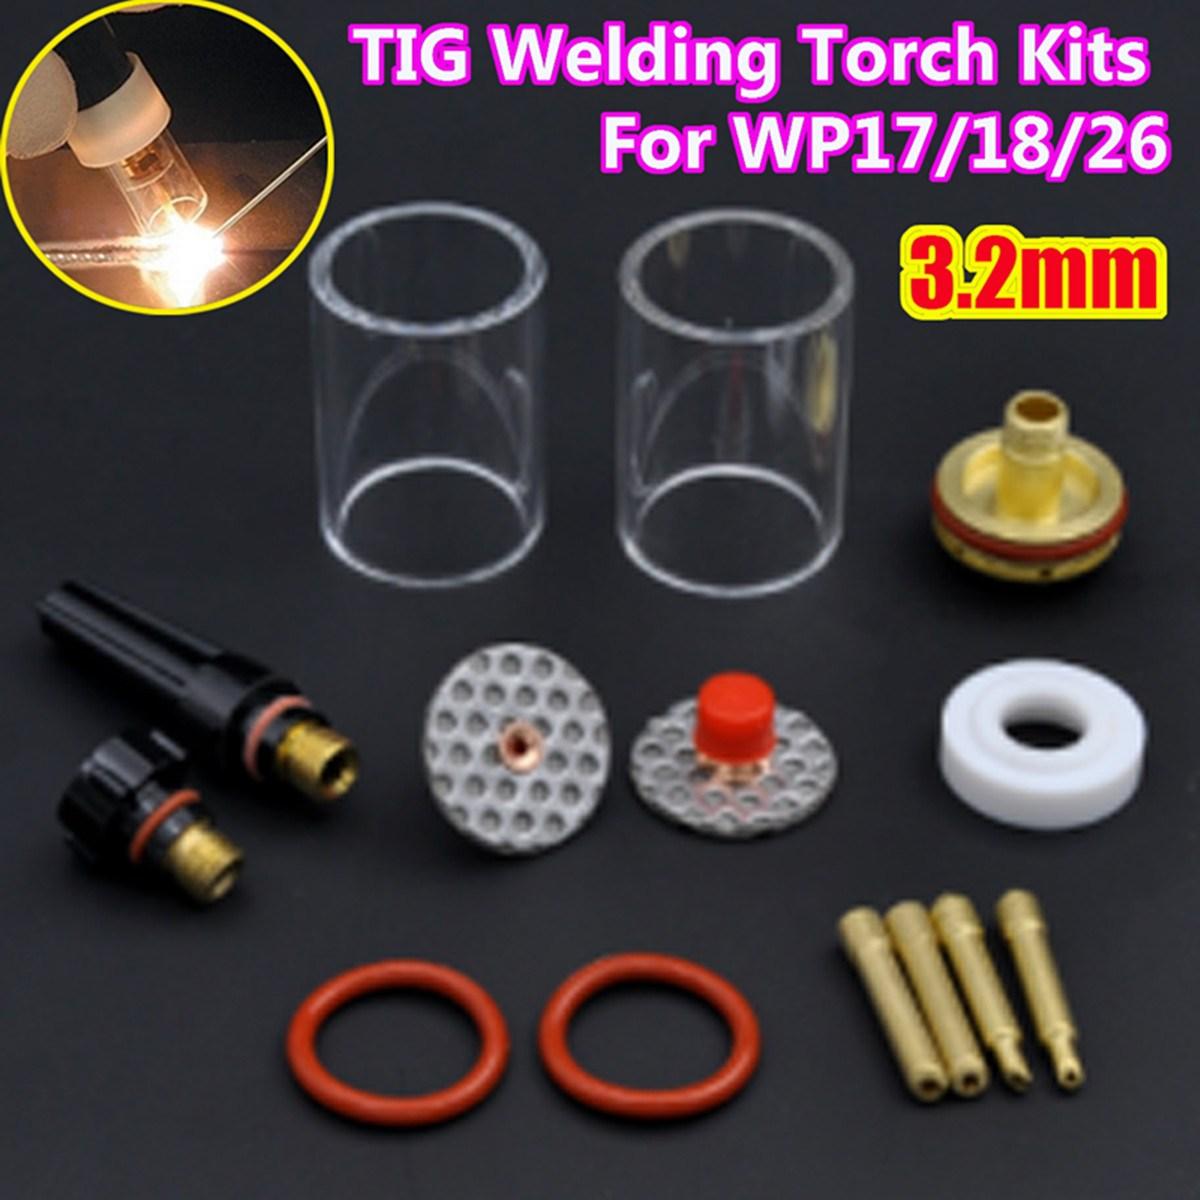 14PCS TIG Welding Torch Stubby Gas Lens Glass Pyrex Cup Kit 3.2mm 1/8 For WP17/18/26 Welding Series 1set 14pcs tig welding torch stubby gas lens glass pyrex cup kit 3 2mm 1 8 for wp17 18 26 welding series